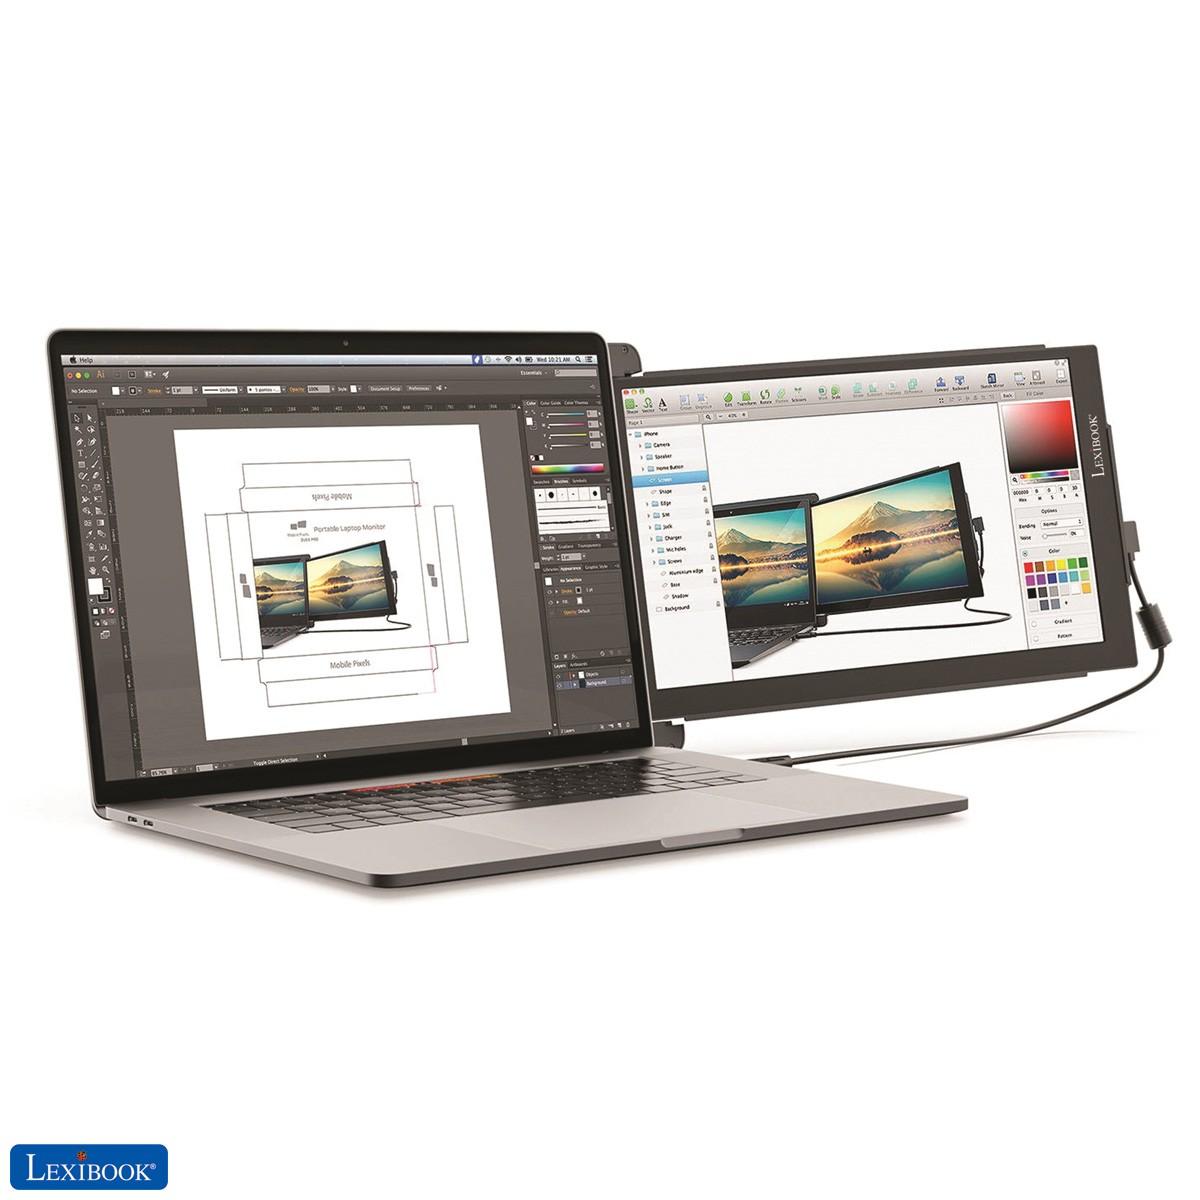 "Trio Max 14"" Portable Monitor for Laptops"